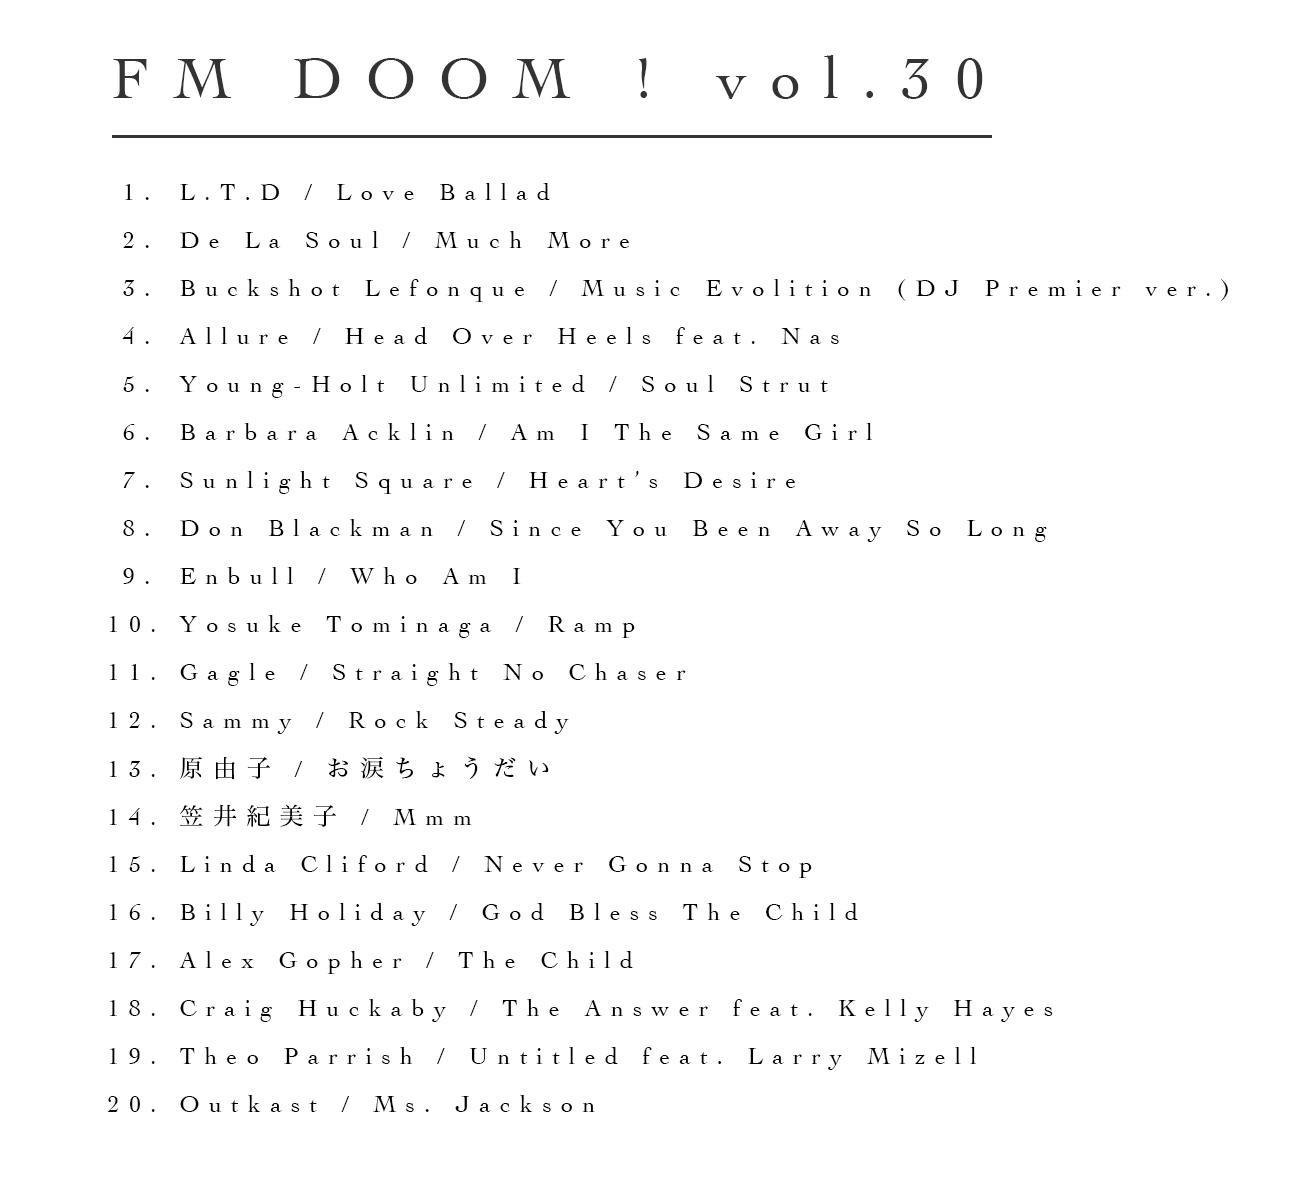 FM DOOM ! vol.30